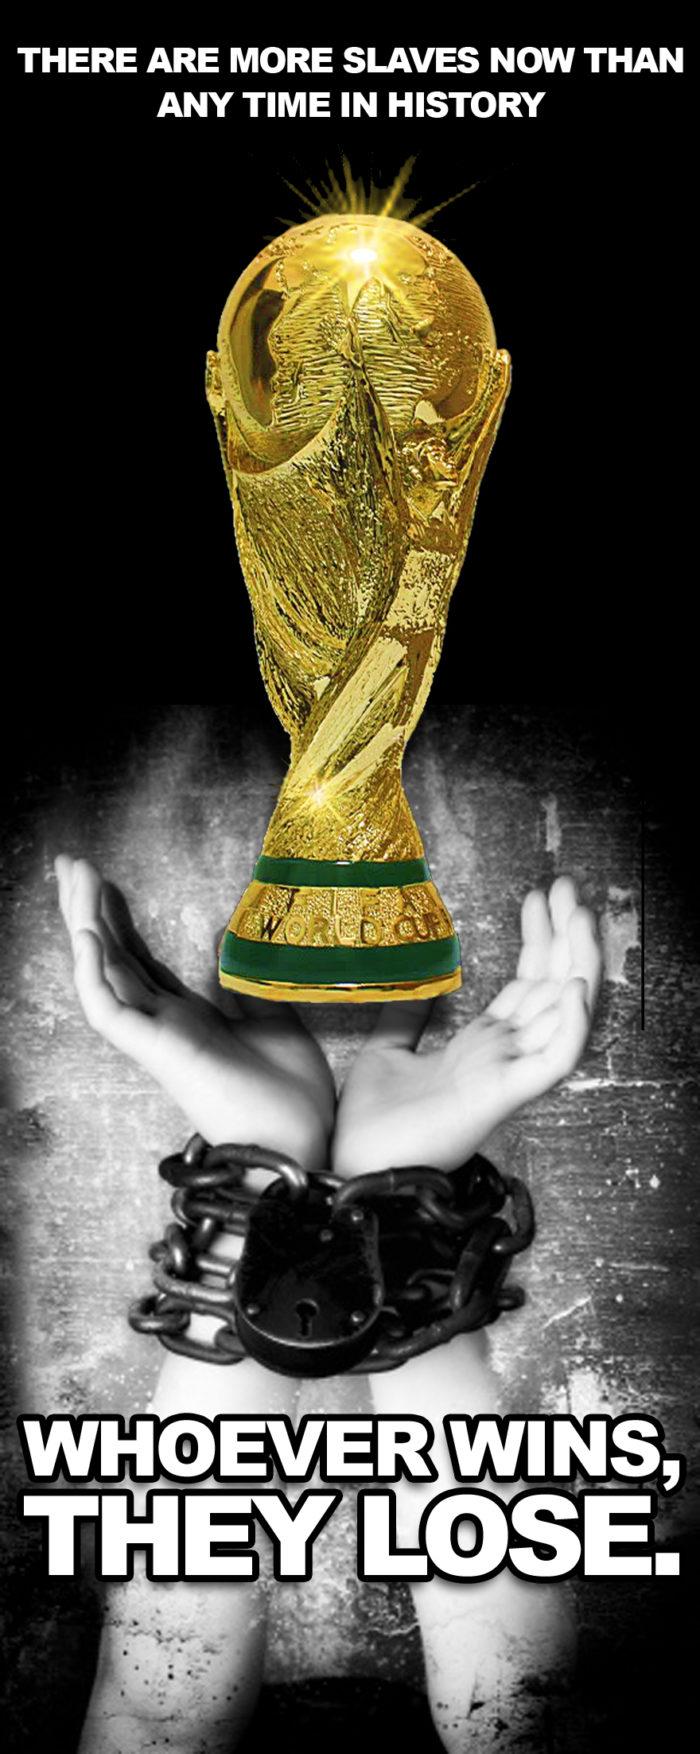 coppa-mondo-qatar-2022-diritti-umani-abusi-marchi-sponsor-loghi-04